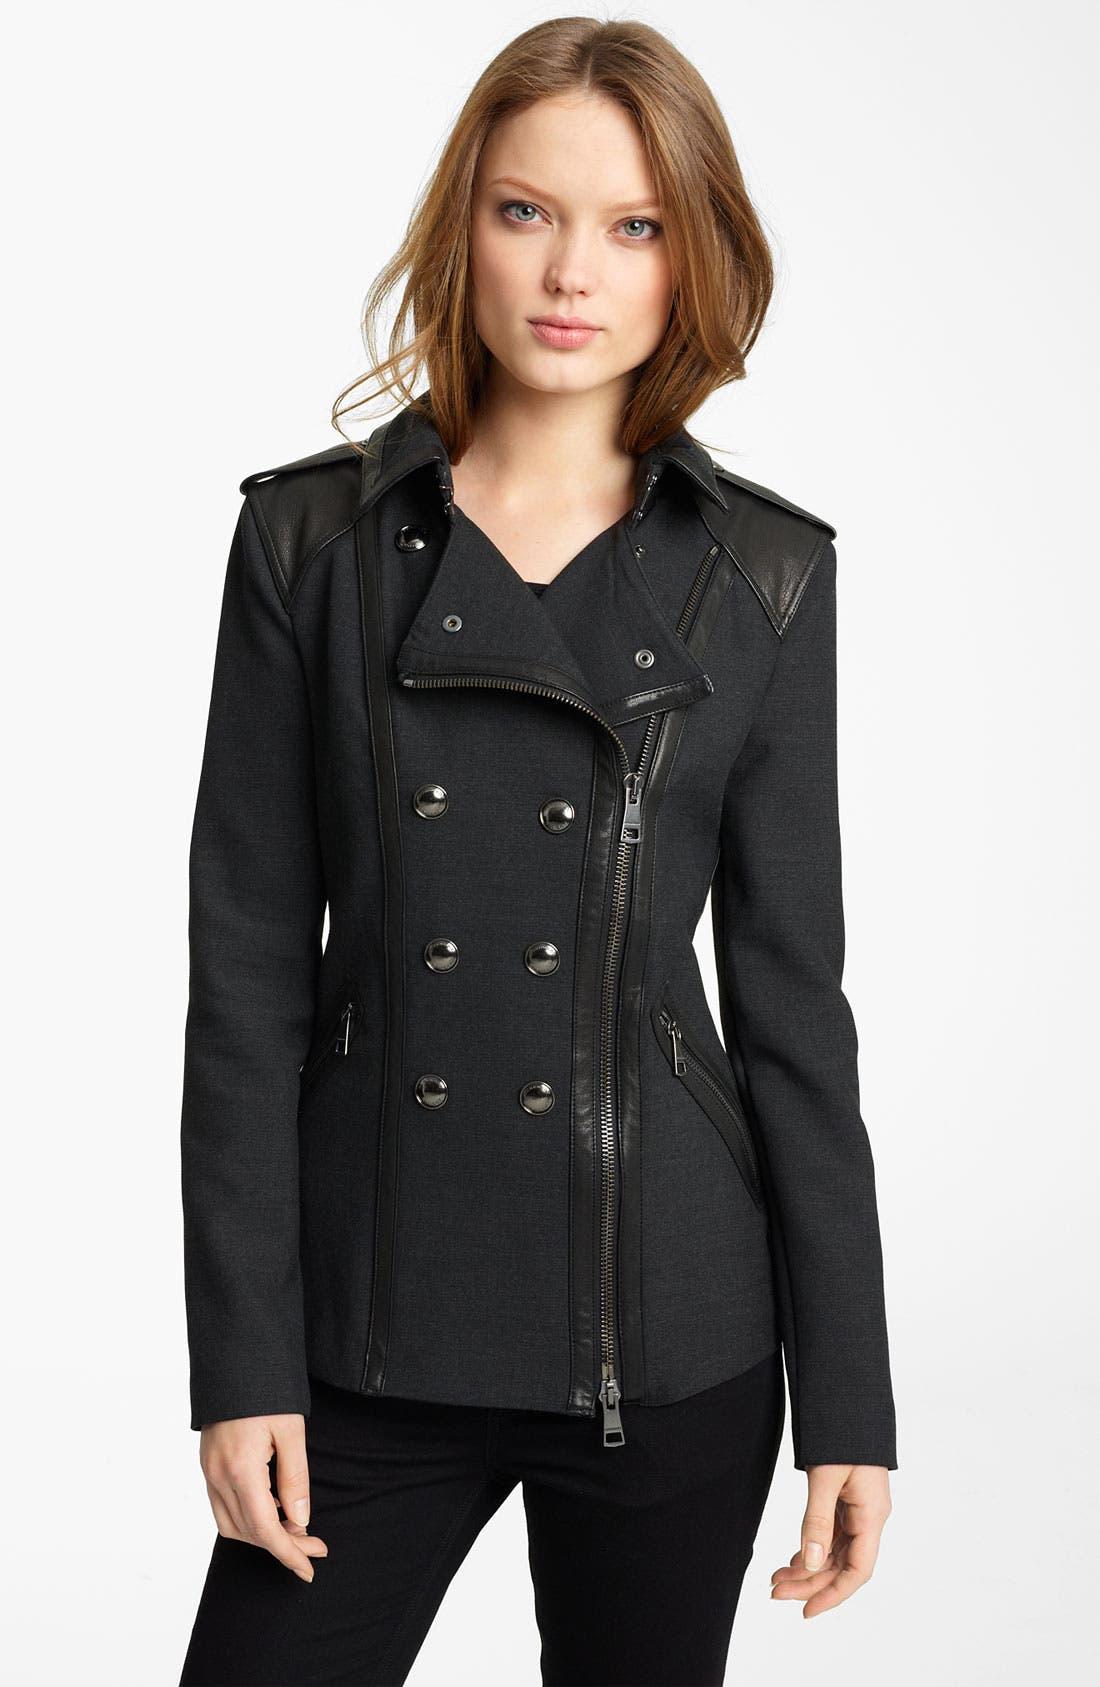 Alternate Image 1 Selected - Burberry London Asymmetrical Jacket